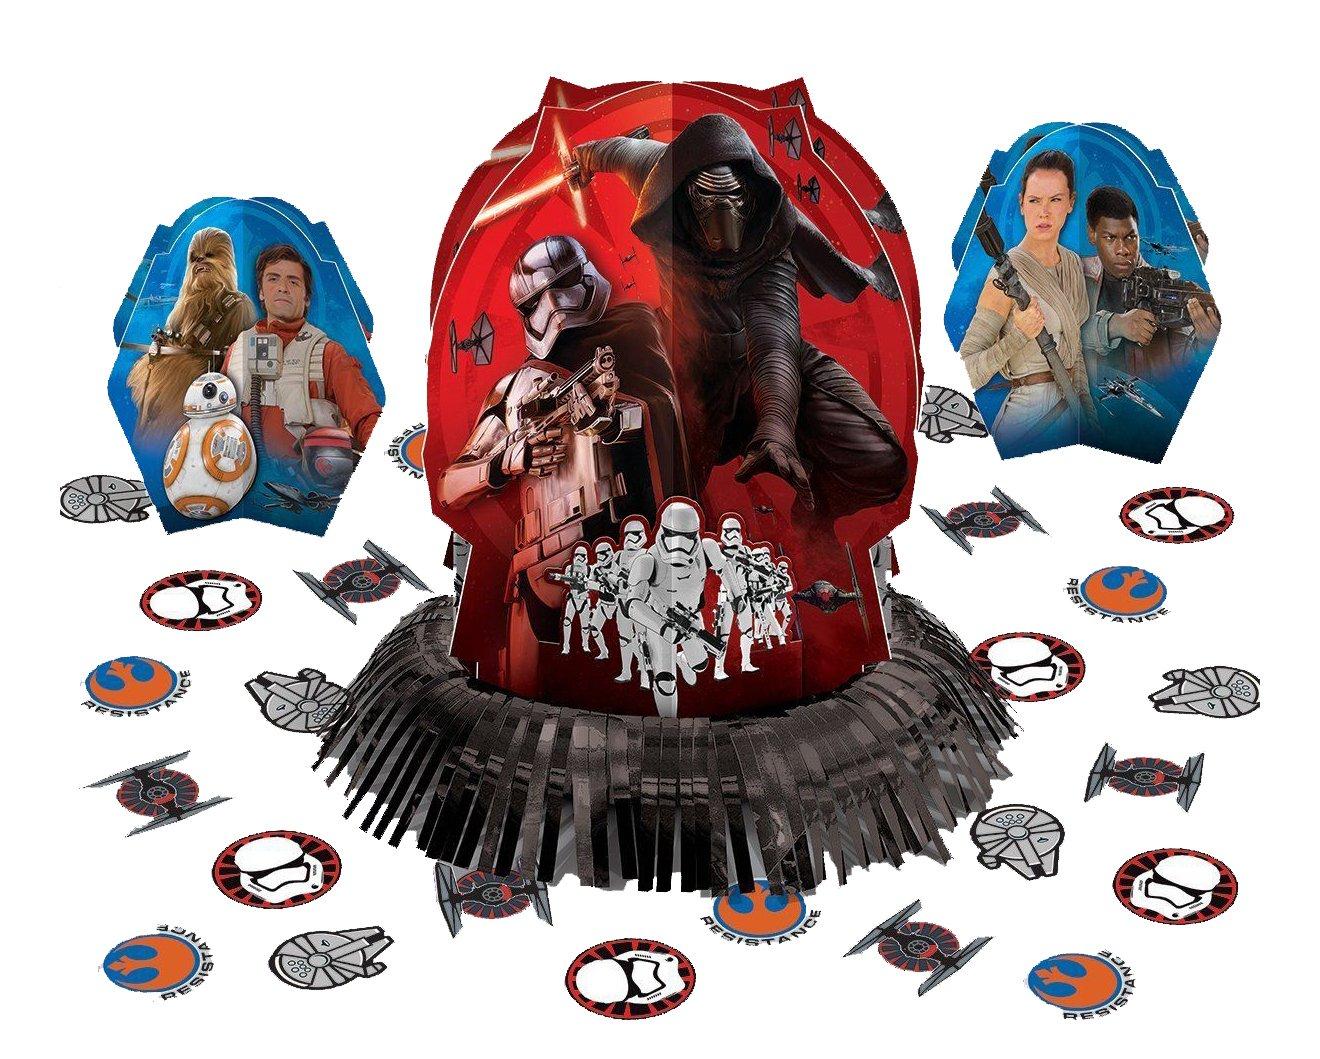 Star Wars Episode VII Table Decorating Kit, Party Favor